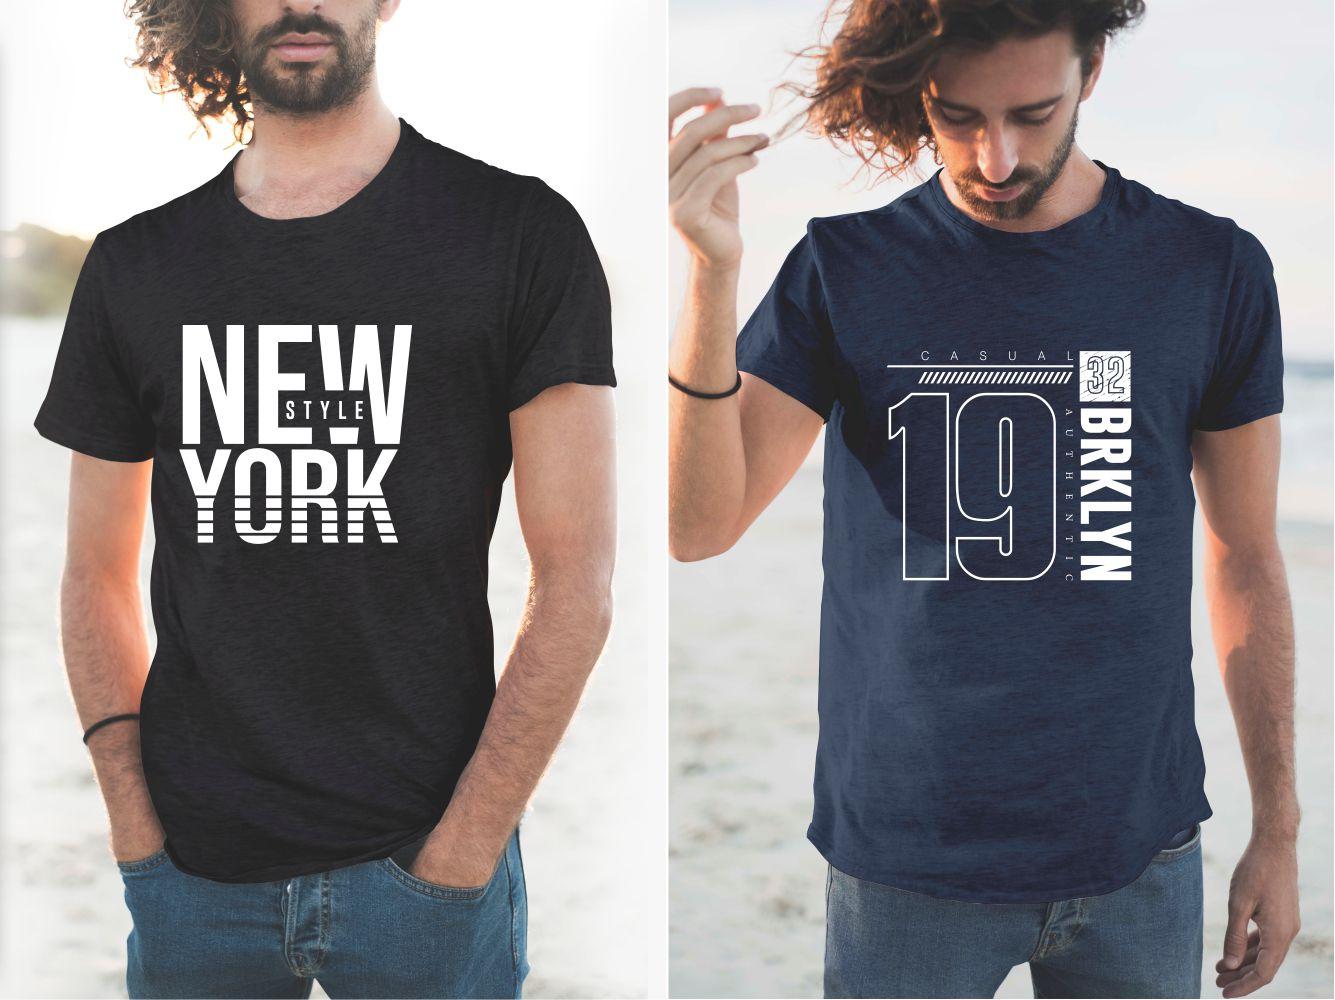 106 Urban T-shirt Designs Collection - 49